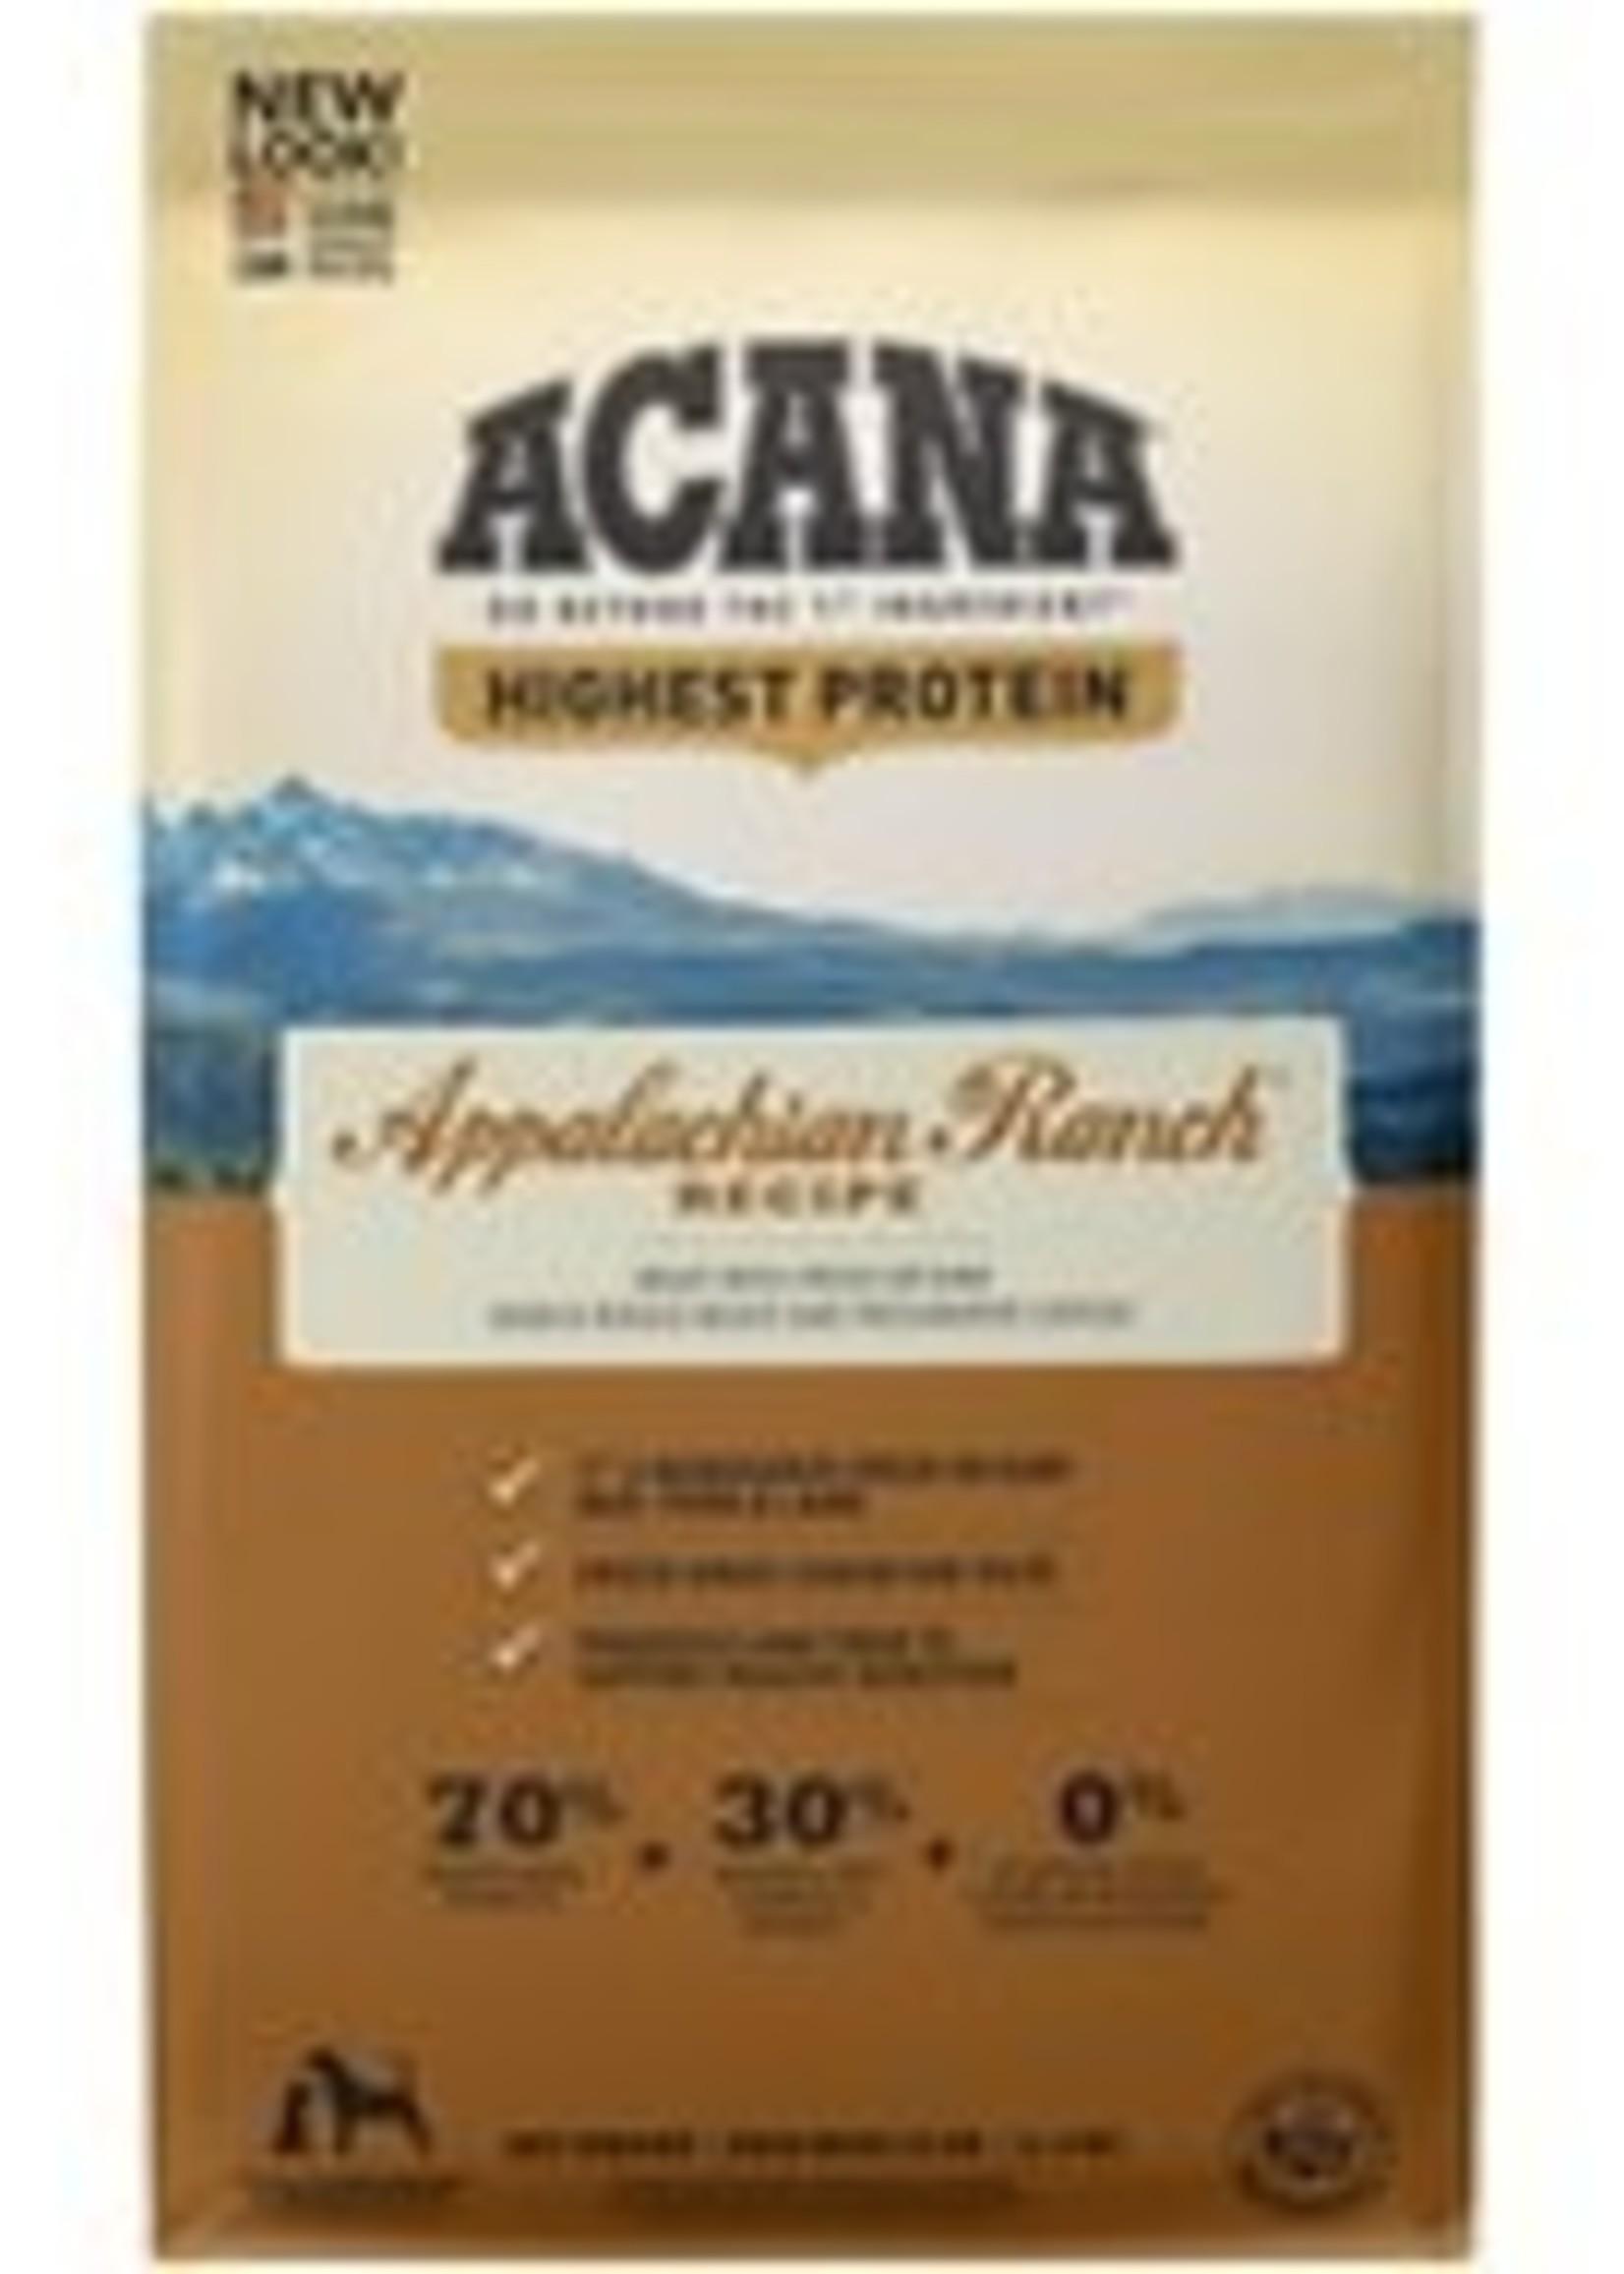 Acana Acana Appalachian Ranch Dry Dog Food 25lb